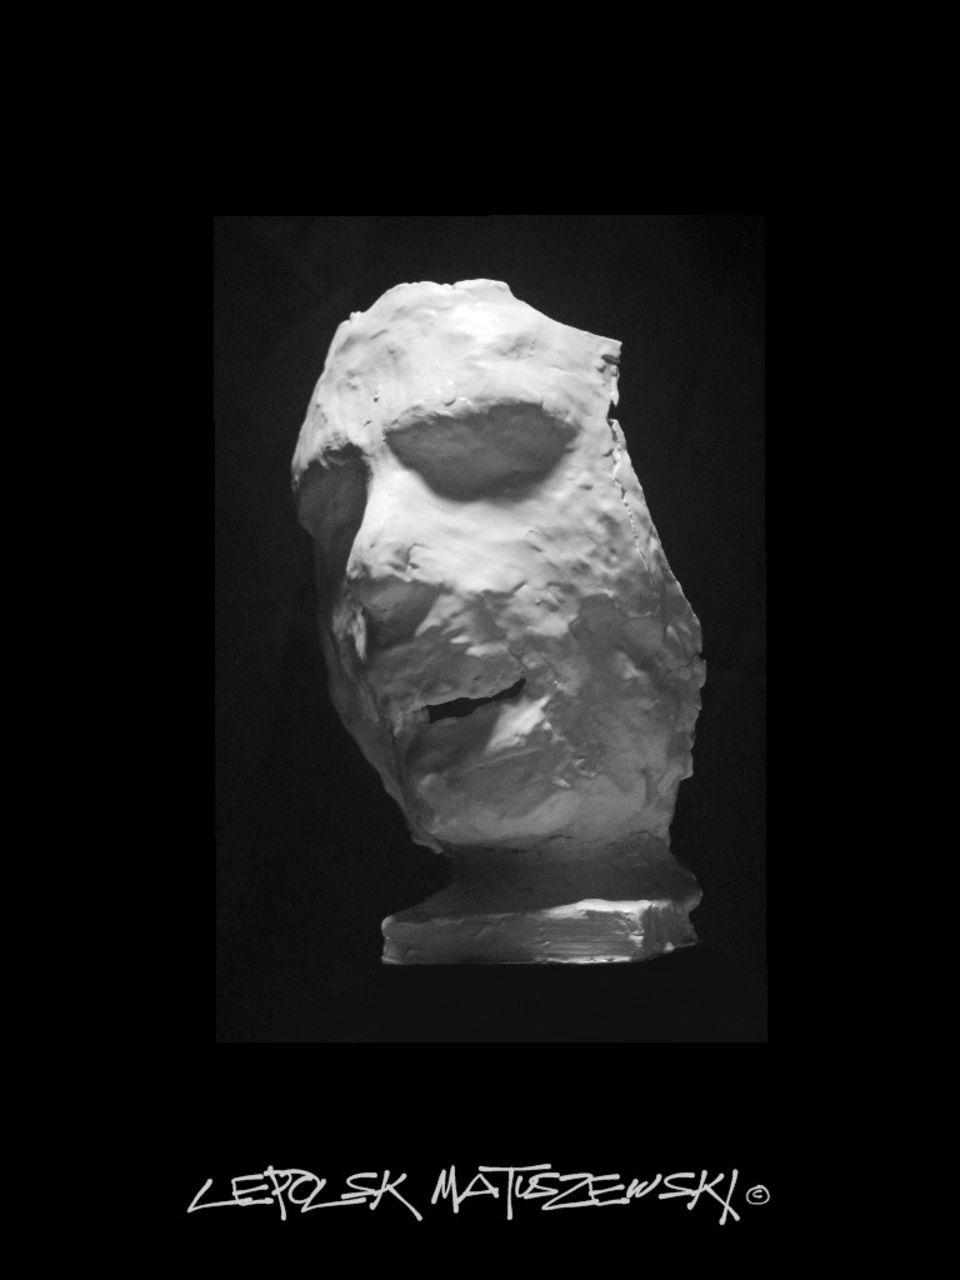 LEPOLSK MATUSZEWSKI ANIMA  sculpture Lepolsk Matuszewski